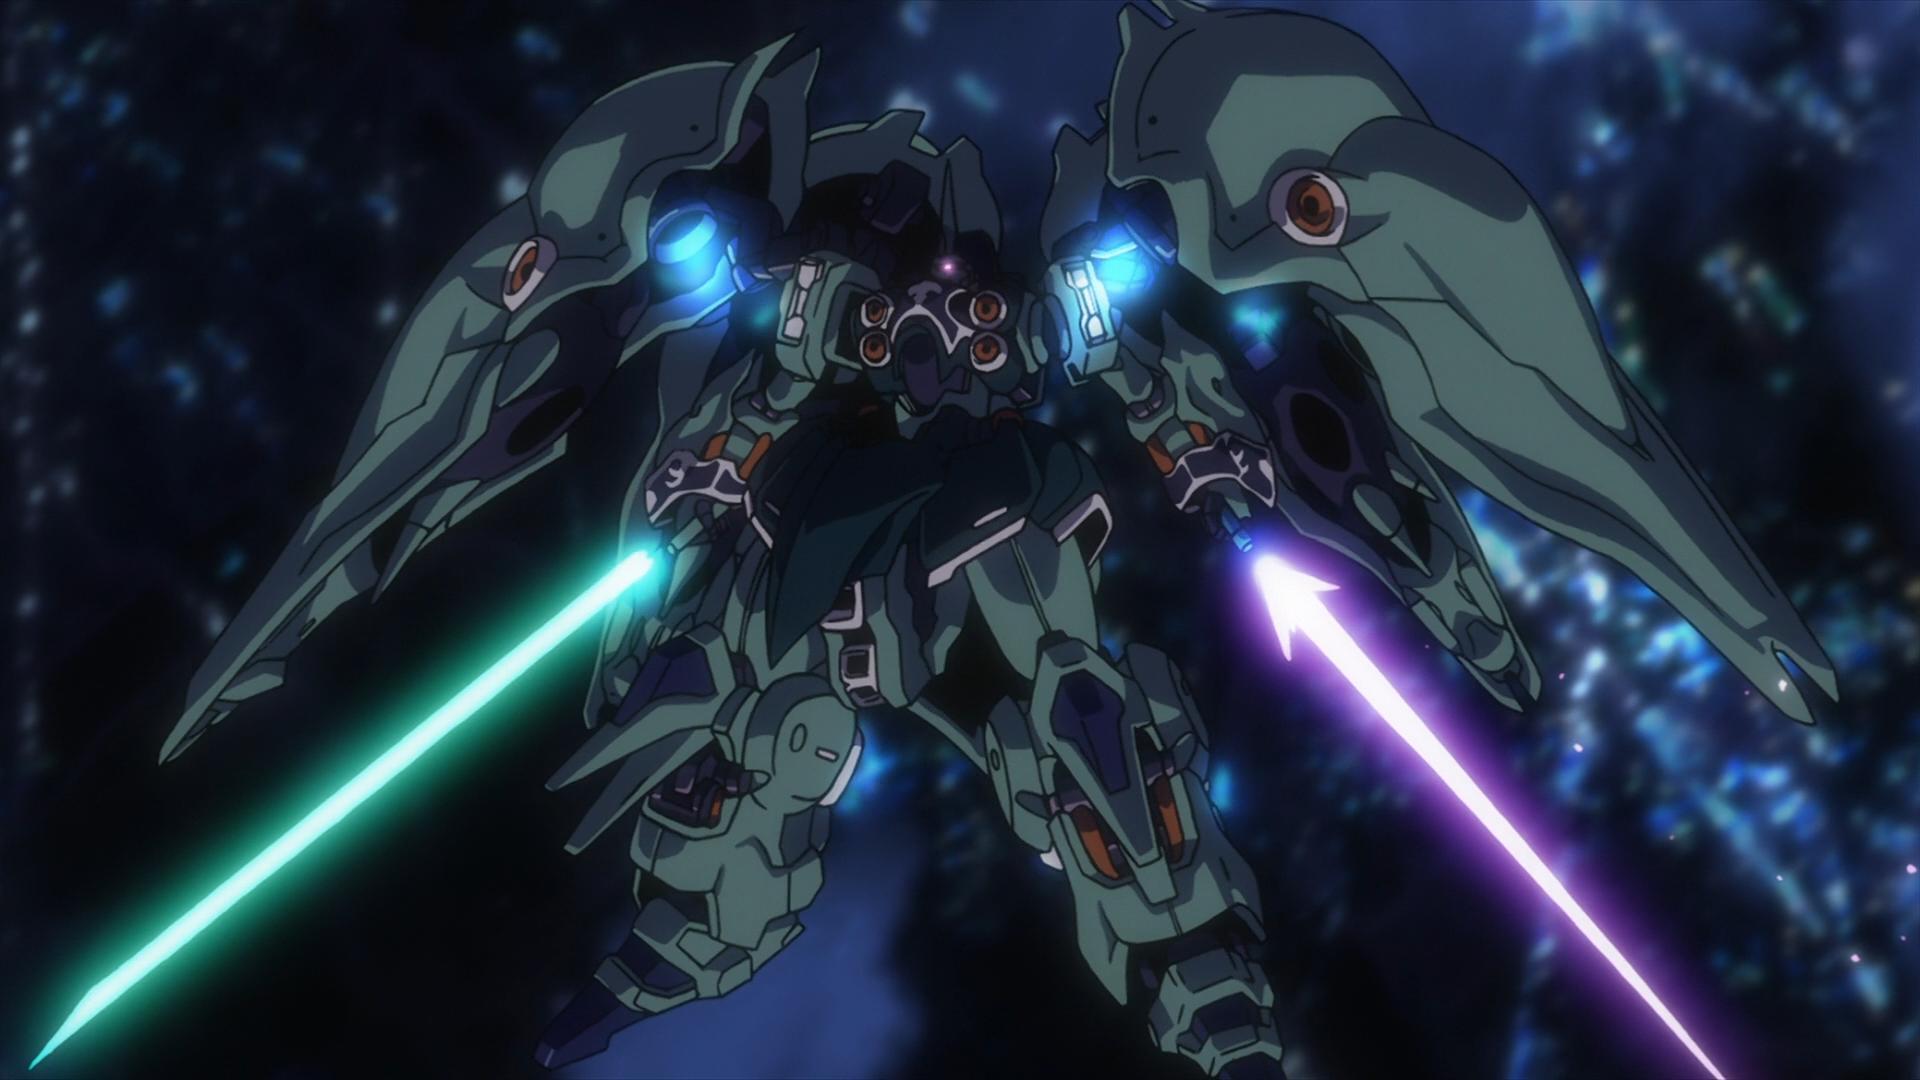 40 Gundam Wing Wallpaper Hd On Wallpapersafari